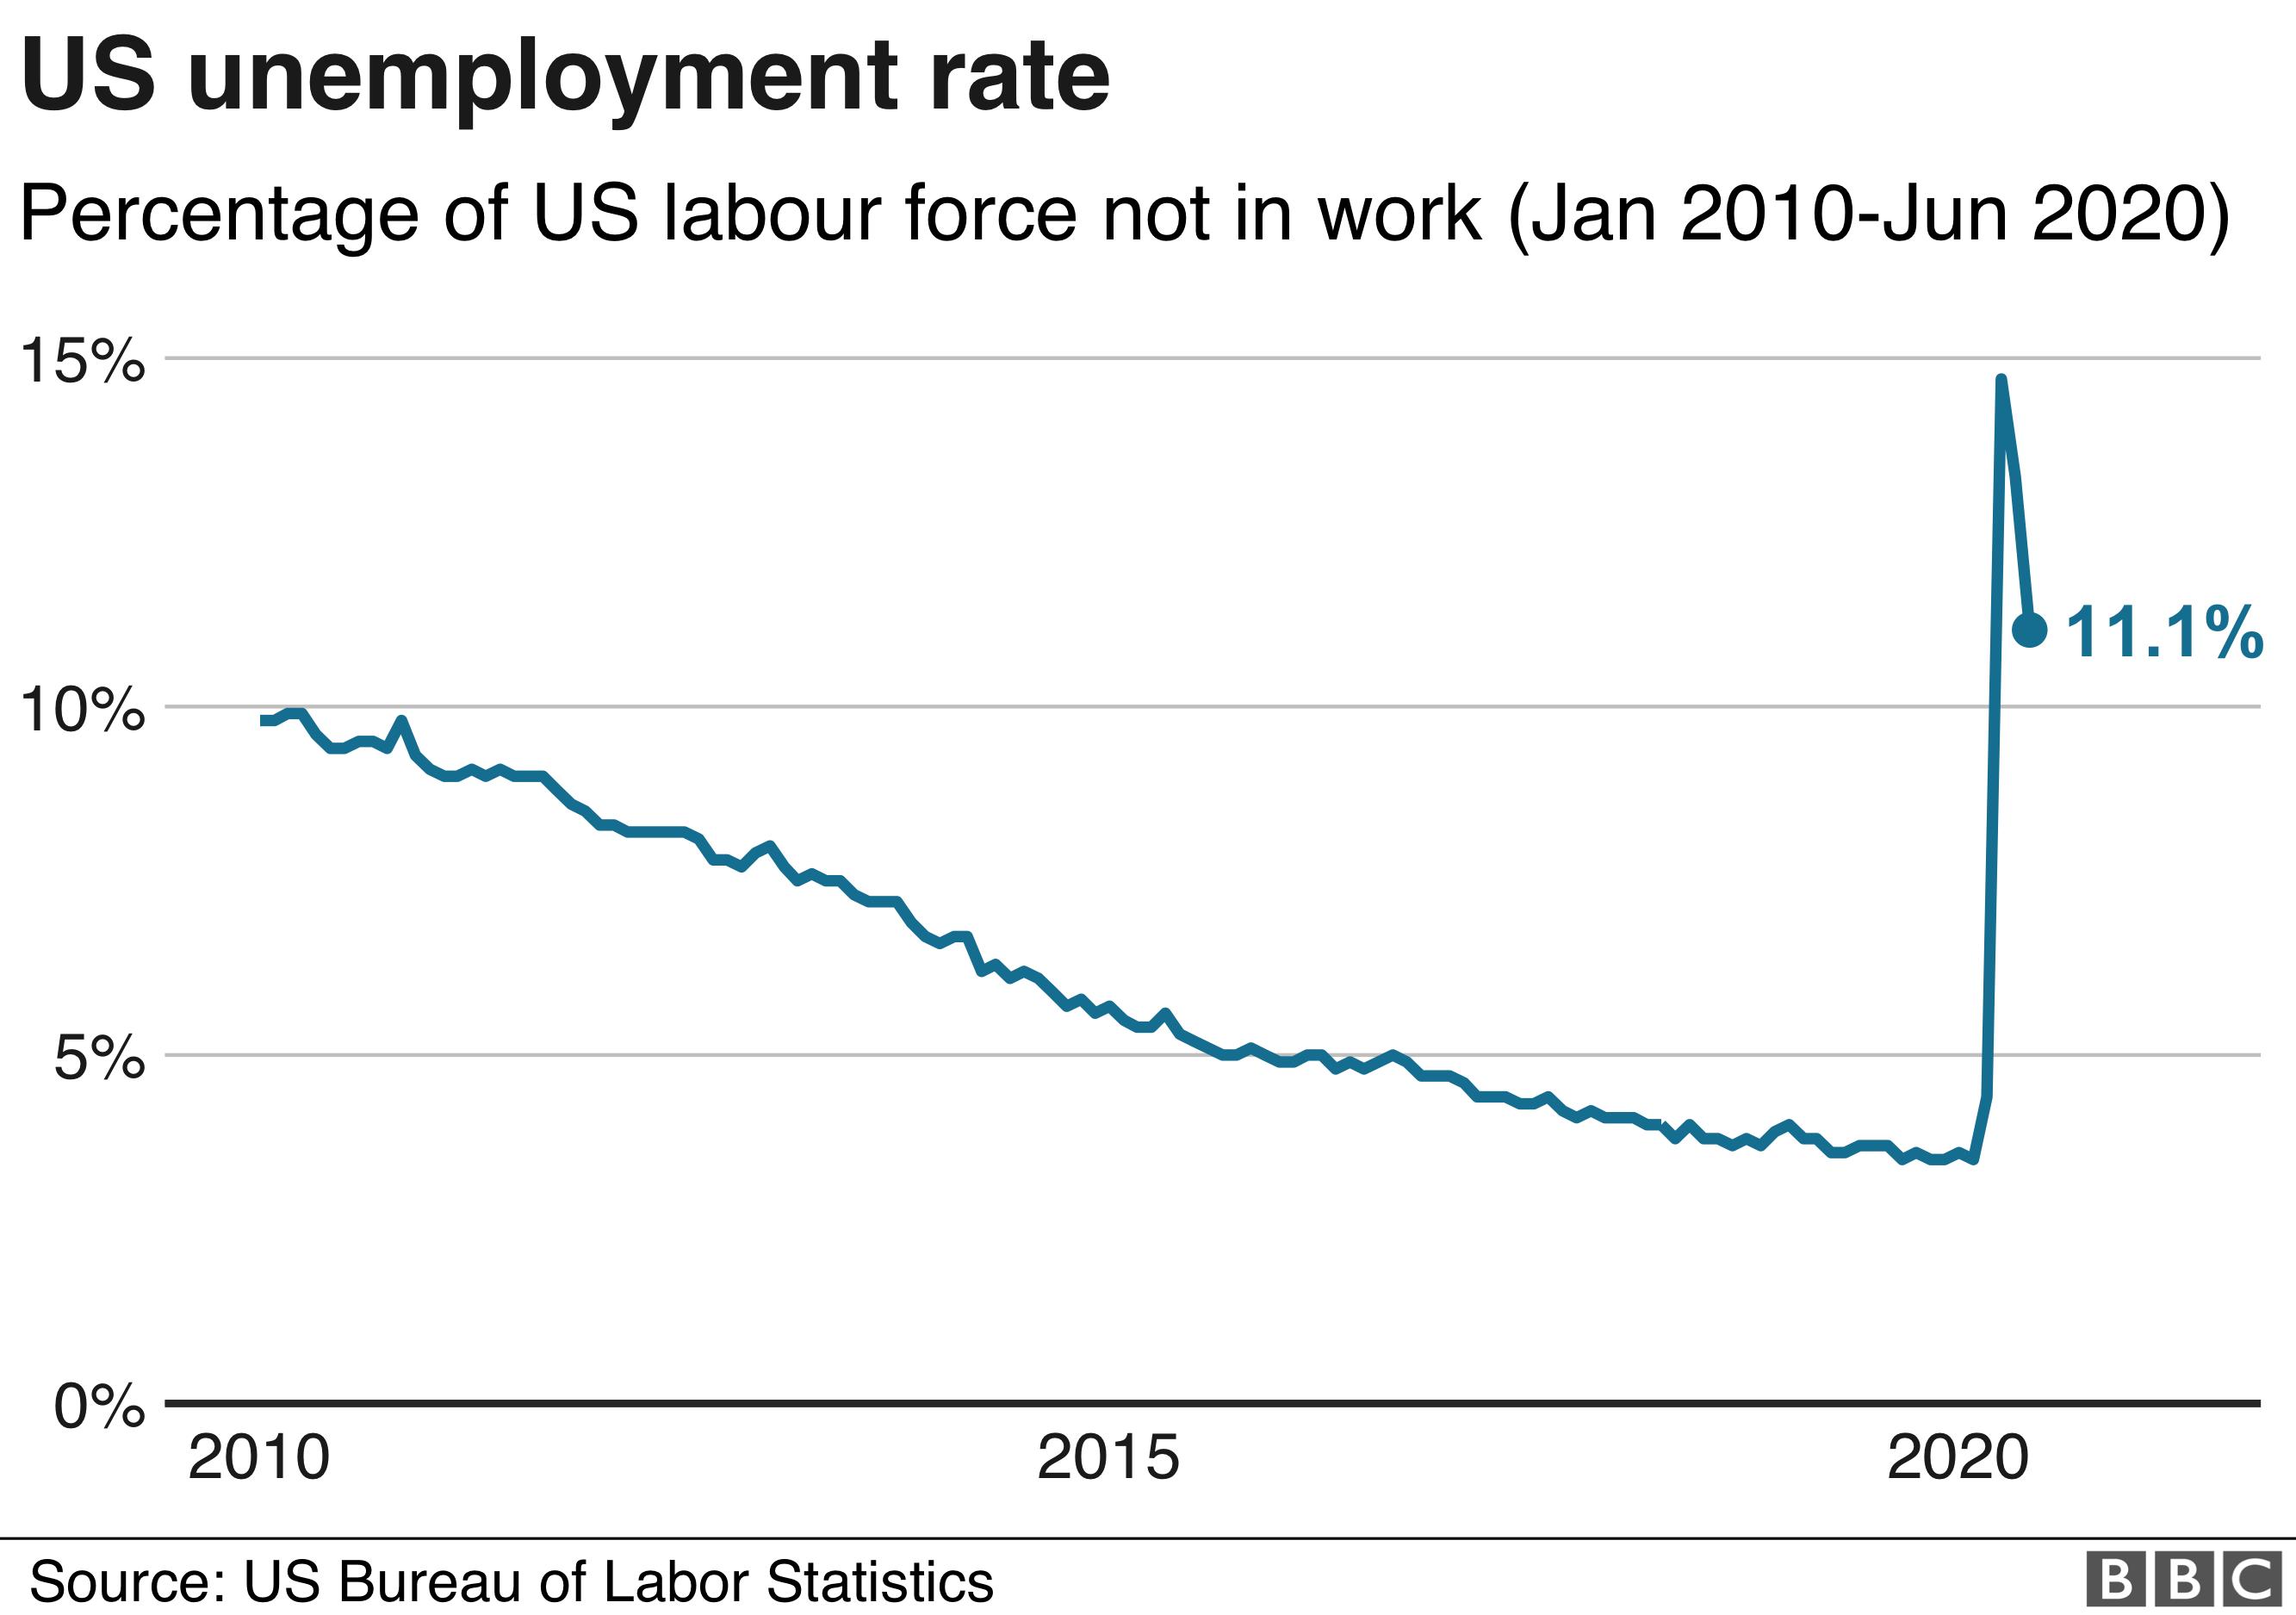 Graph showing US unemployment rate